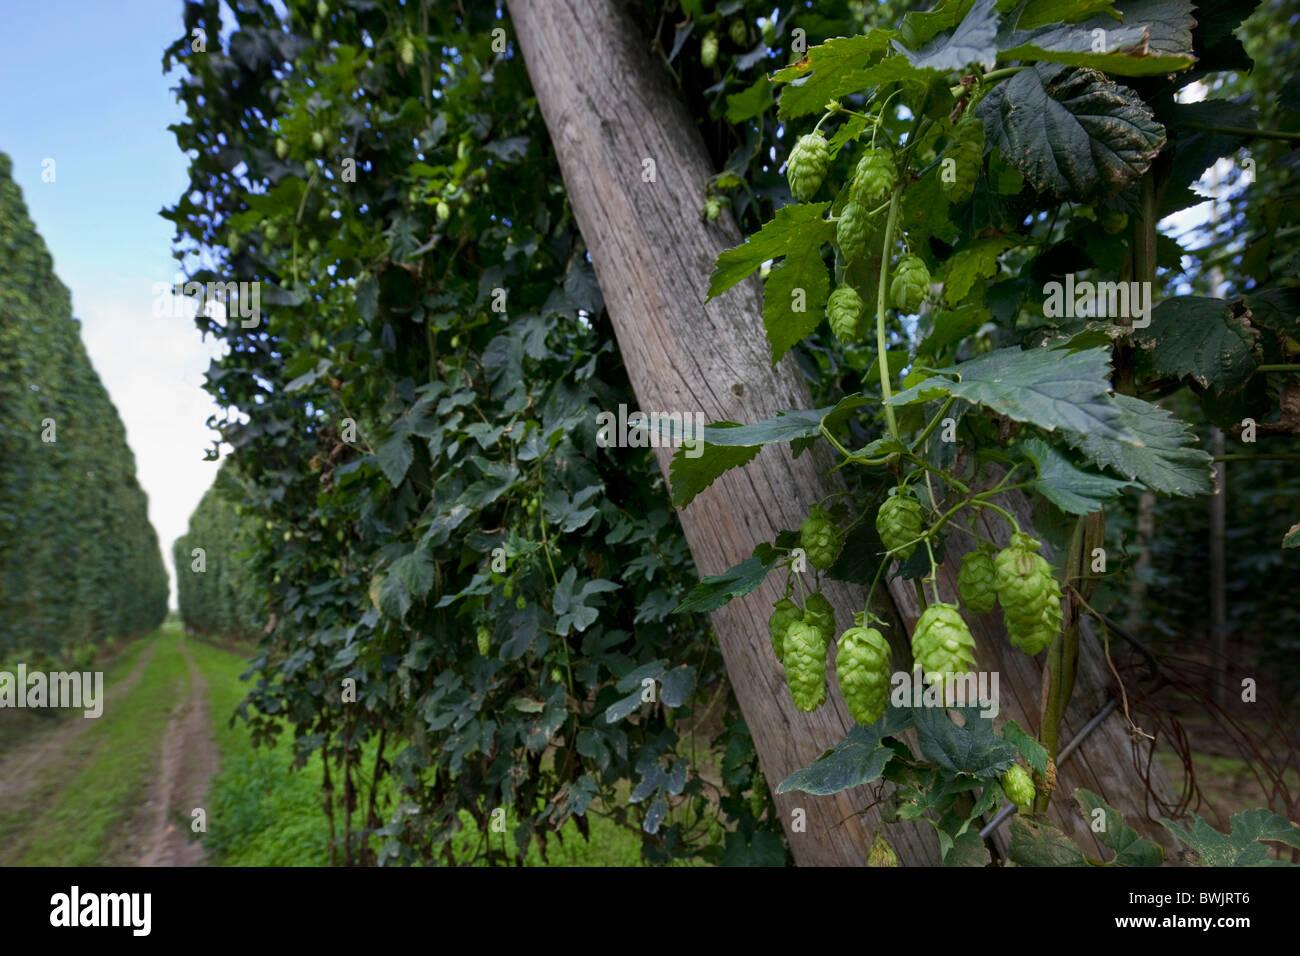 Harvesting of hops (Humulus lupulus), Poperinge, Belgium - Stock Image